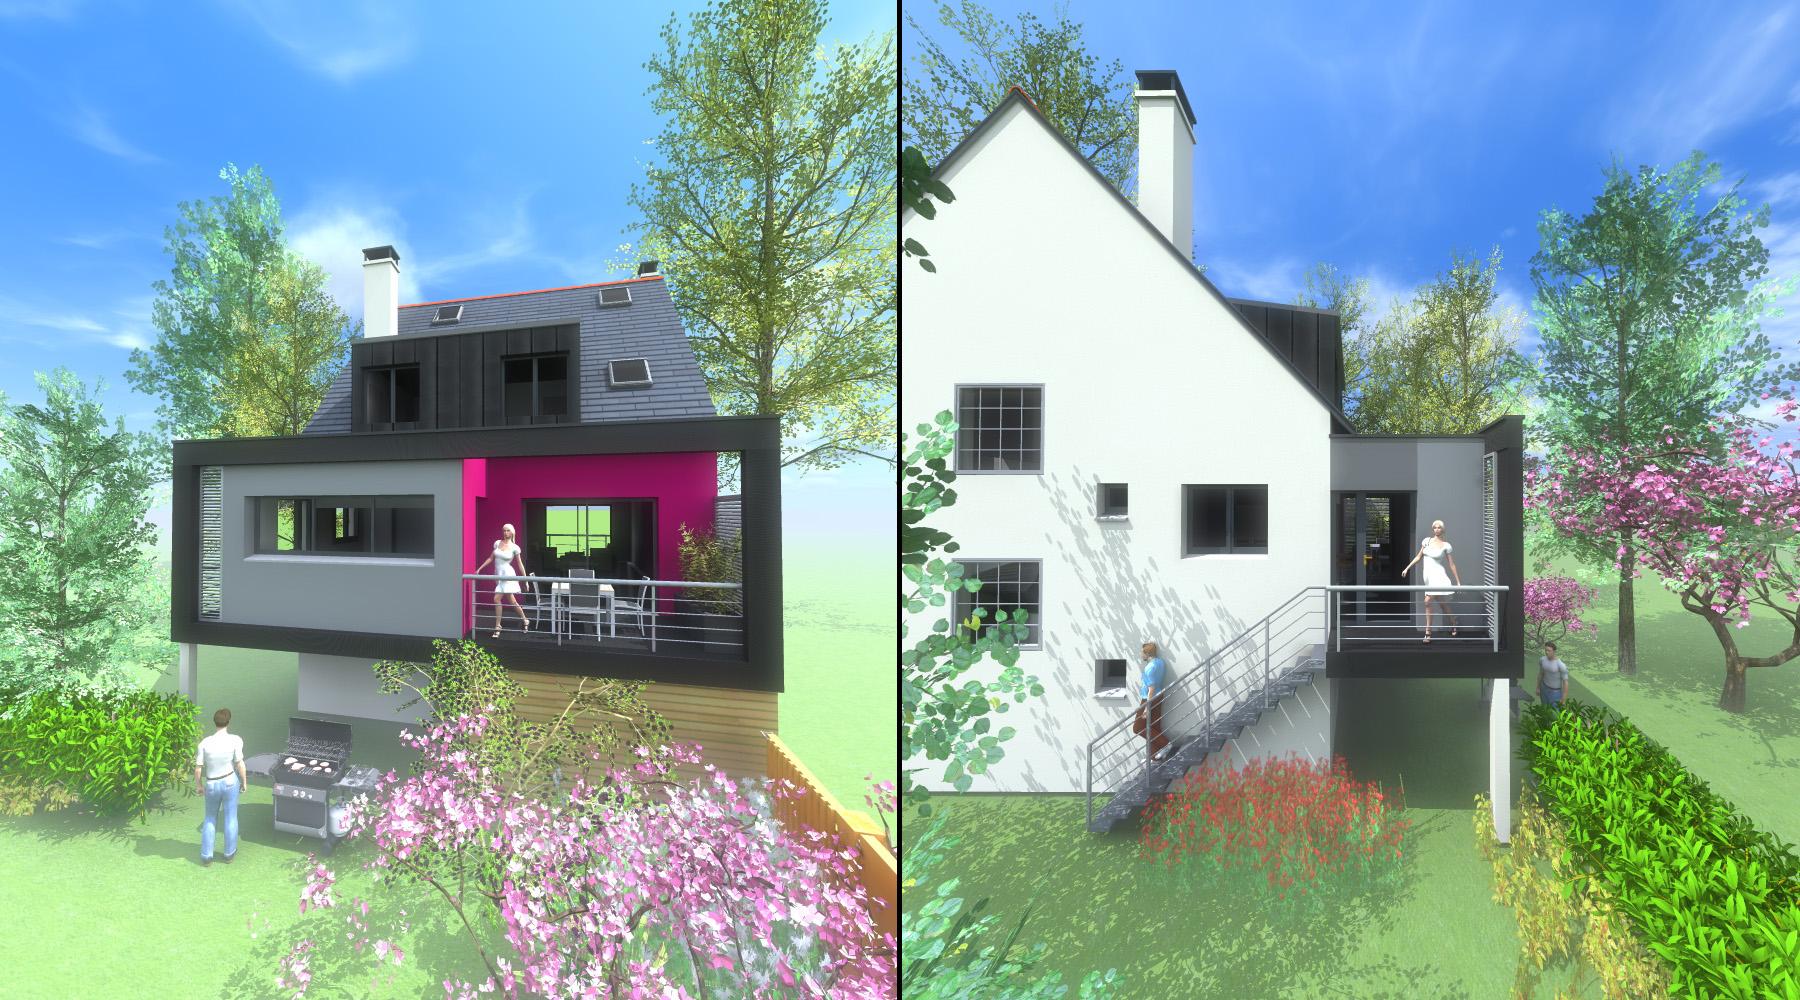 Projet r 1 2 vue architecte lise roturier rennes for Projet extension